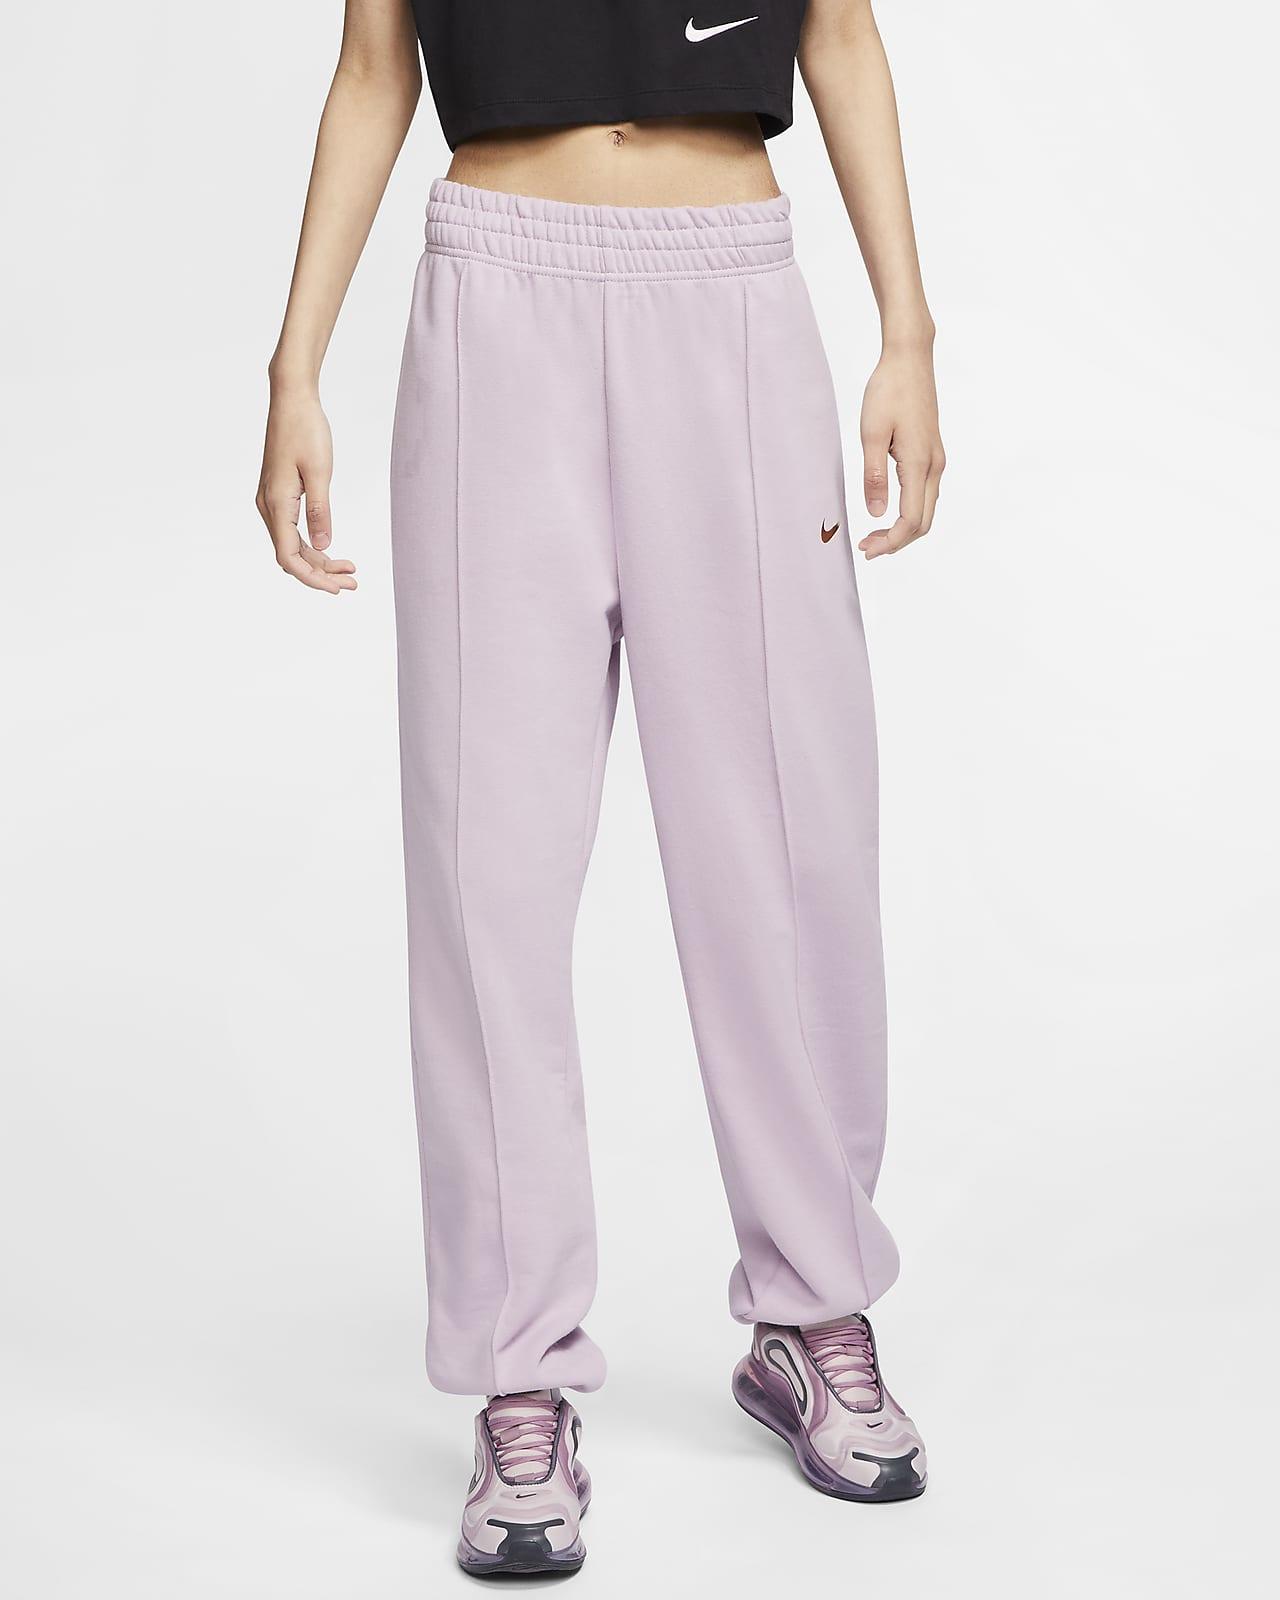 Nike Sportswear női nadrág